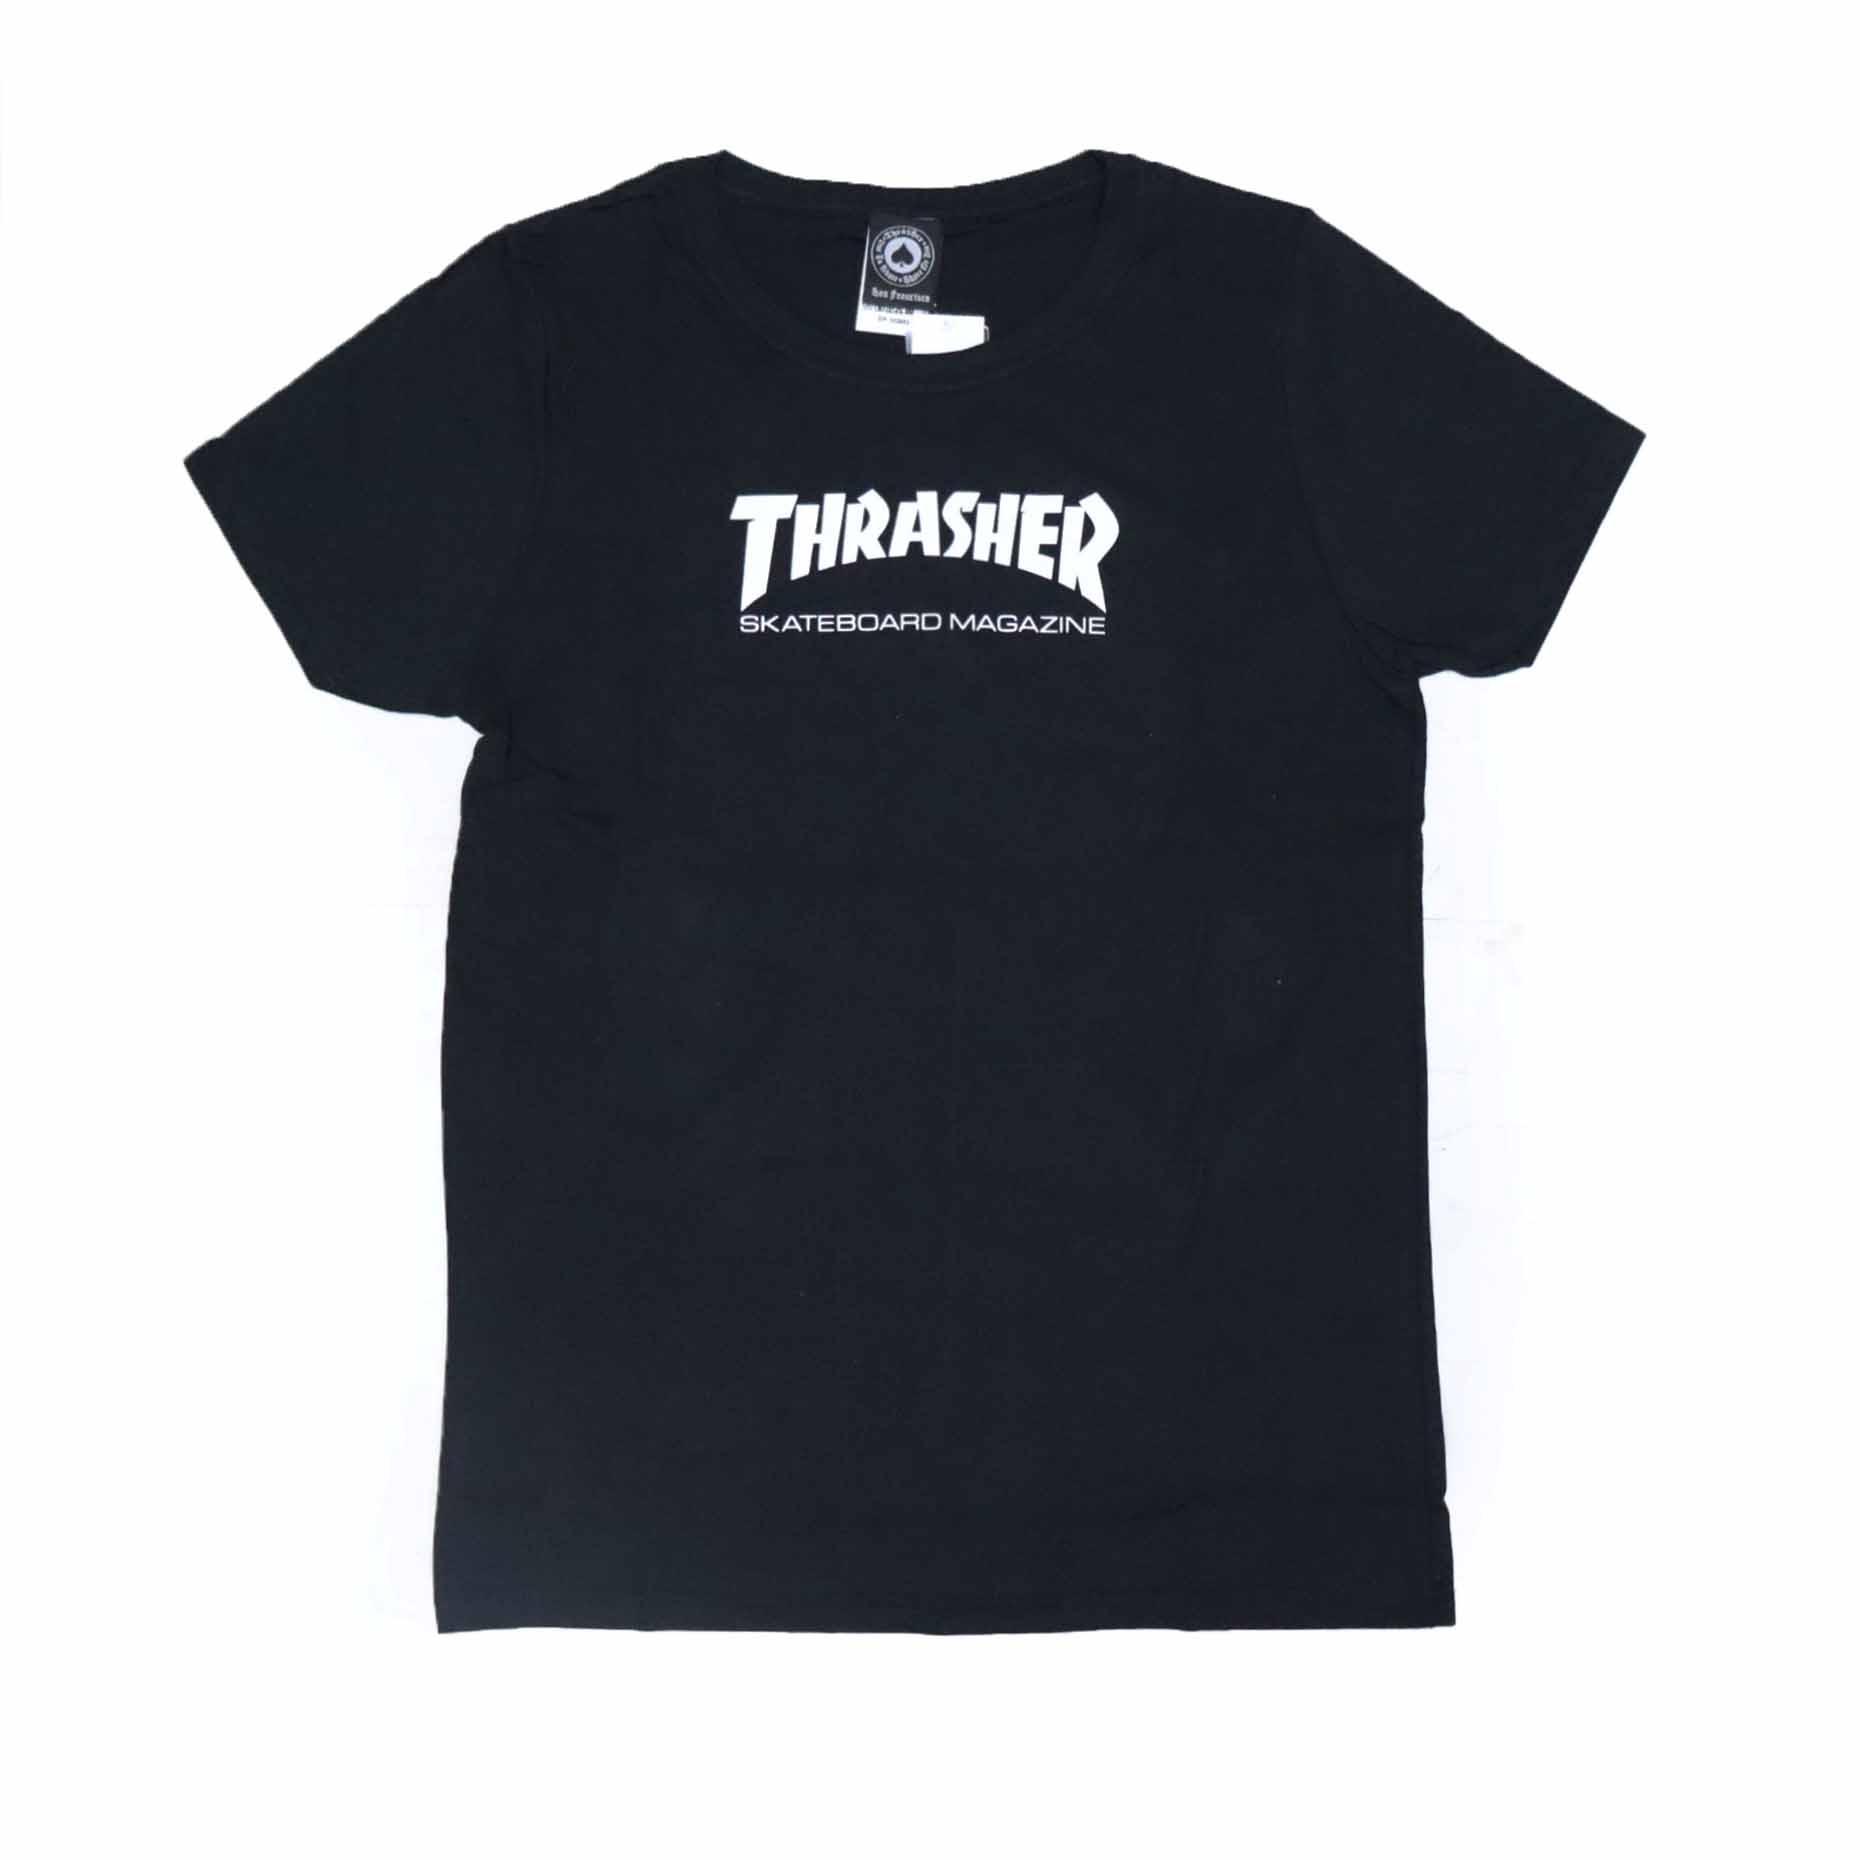 Camiseta Feminina Thrasher Magazine Skate Mag - Preto